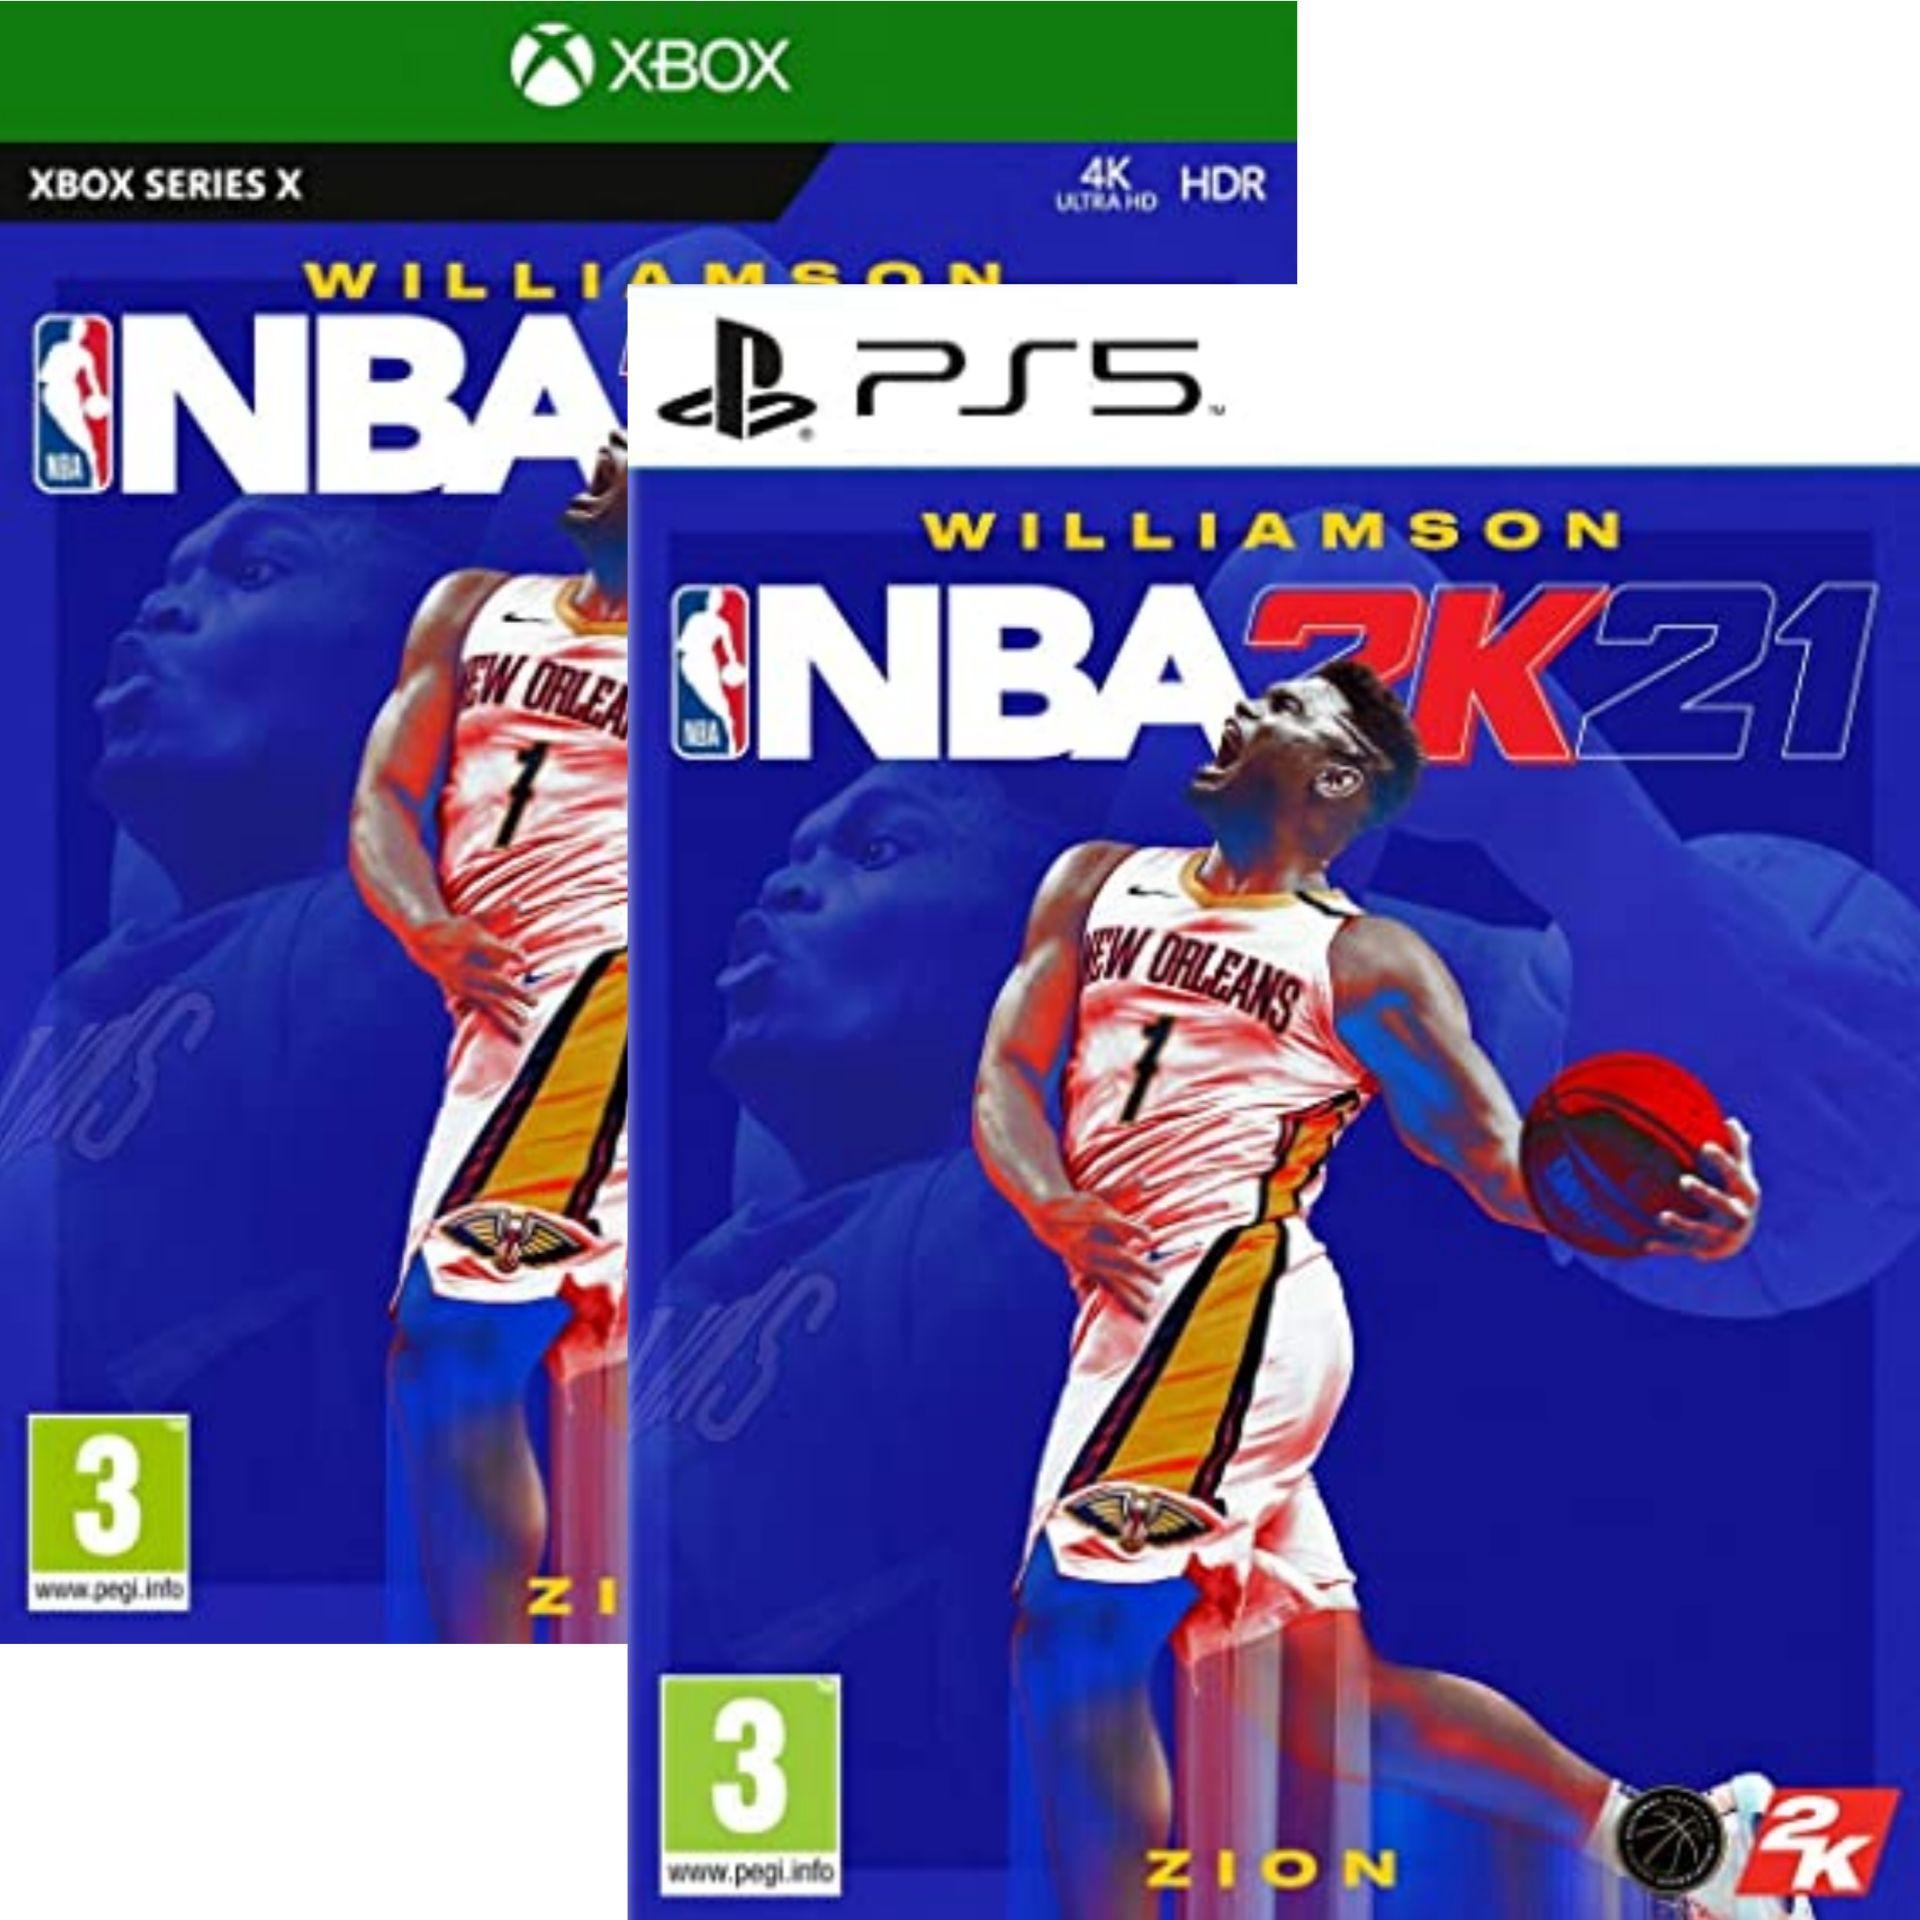 NBA 2K21 sur PS5 ou Xbox Series X (PS4 à 14.99€)